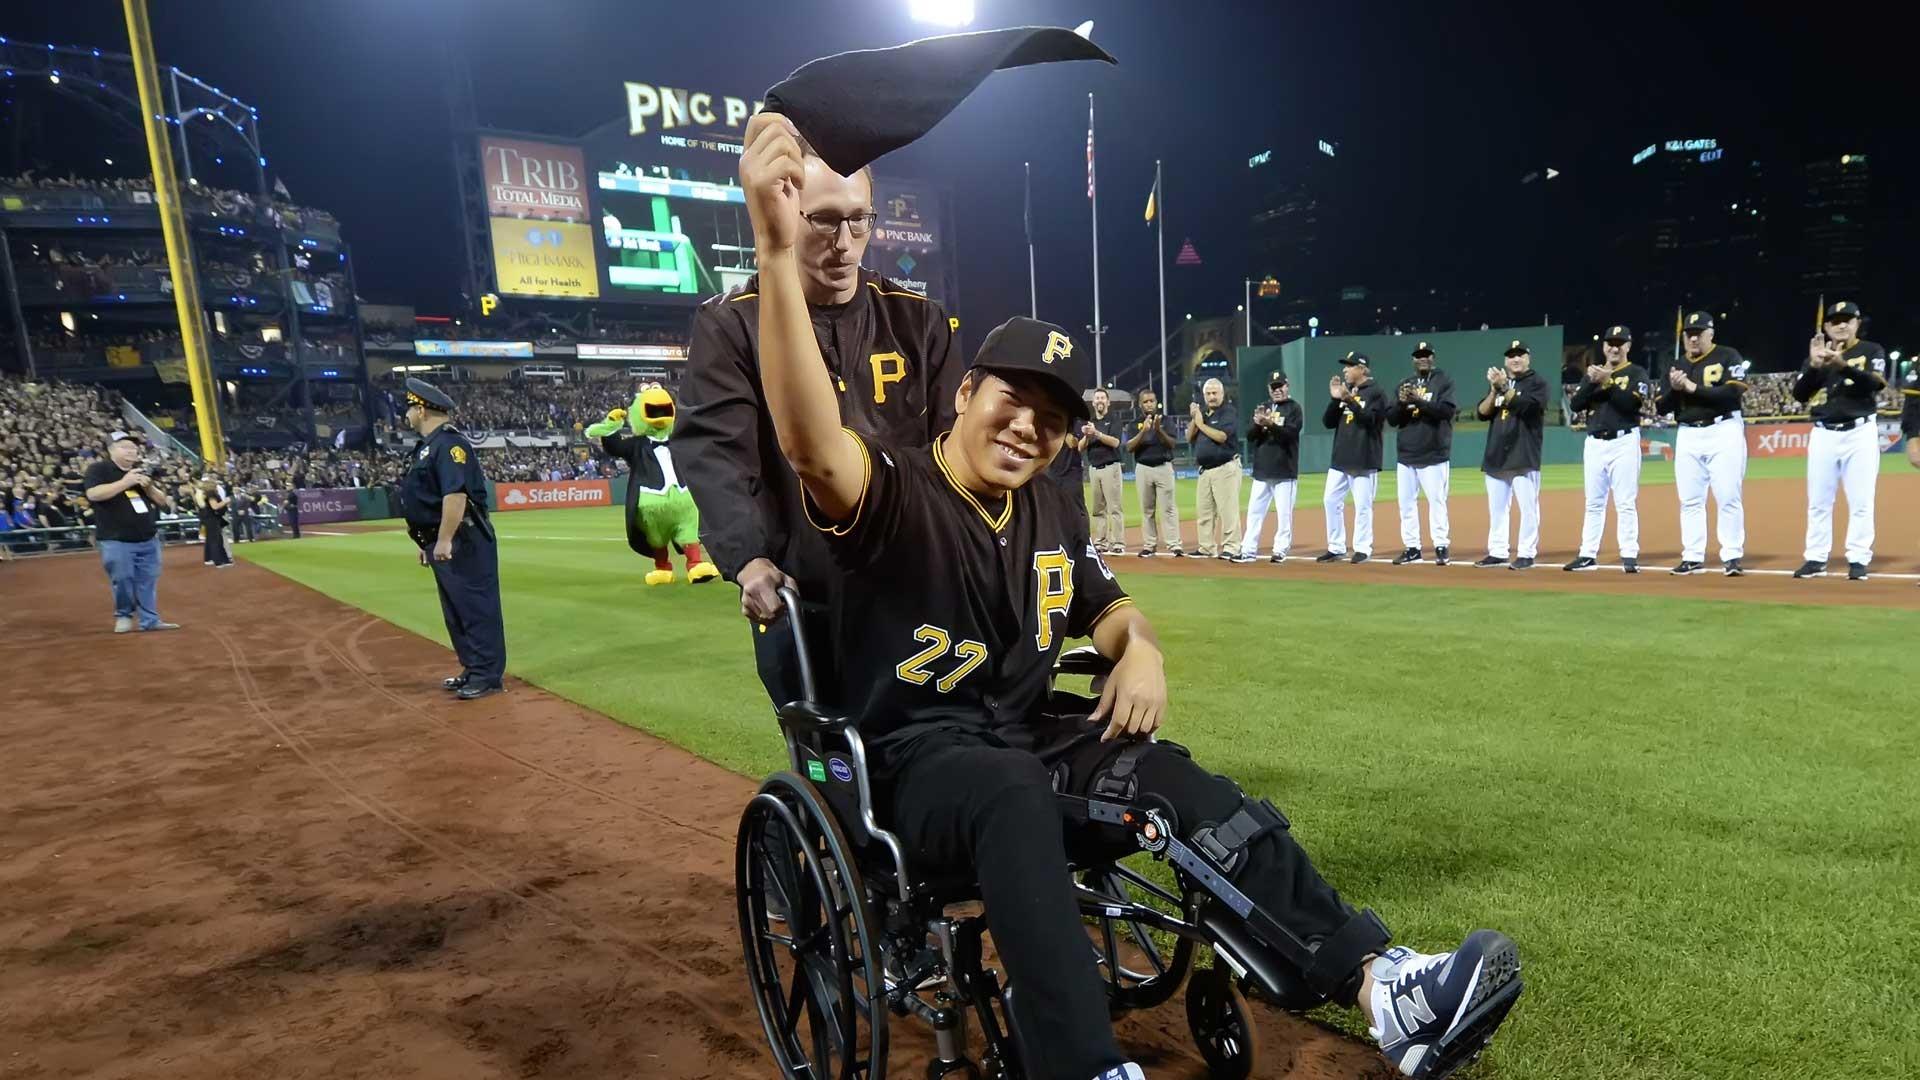 Jung Ho Kang makes Pittsburgh his home: Pirates 2016   Pittsburgh  Post-Gazette